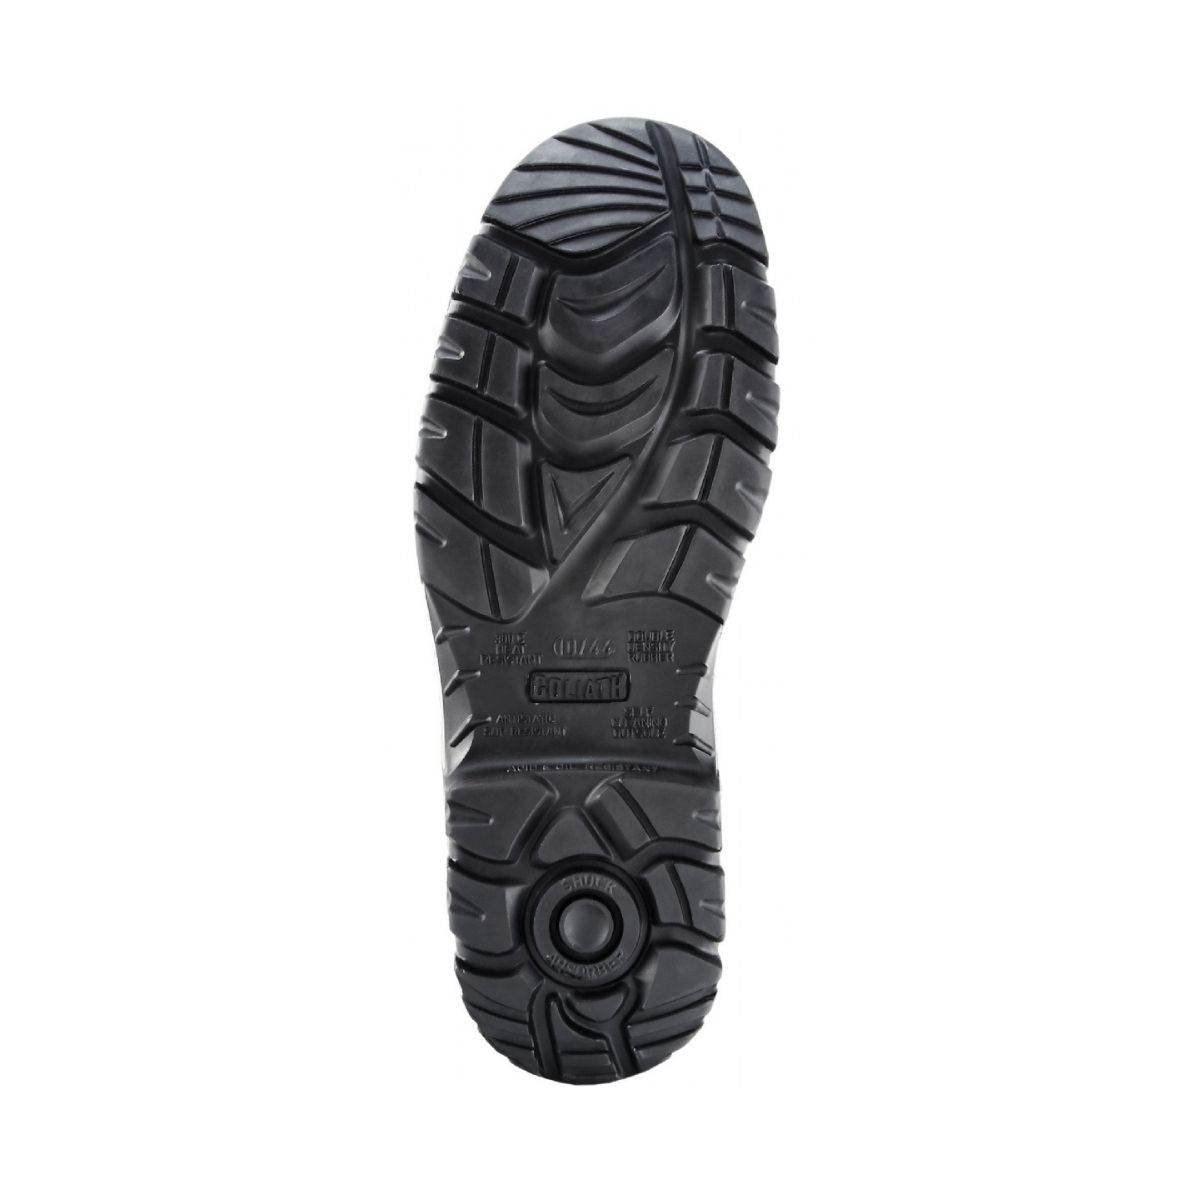 SF0072 Goliath DDR Rubber Petrochem High Leg Zip Boot - Sole